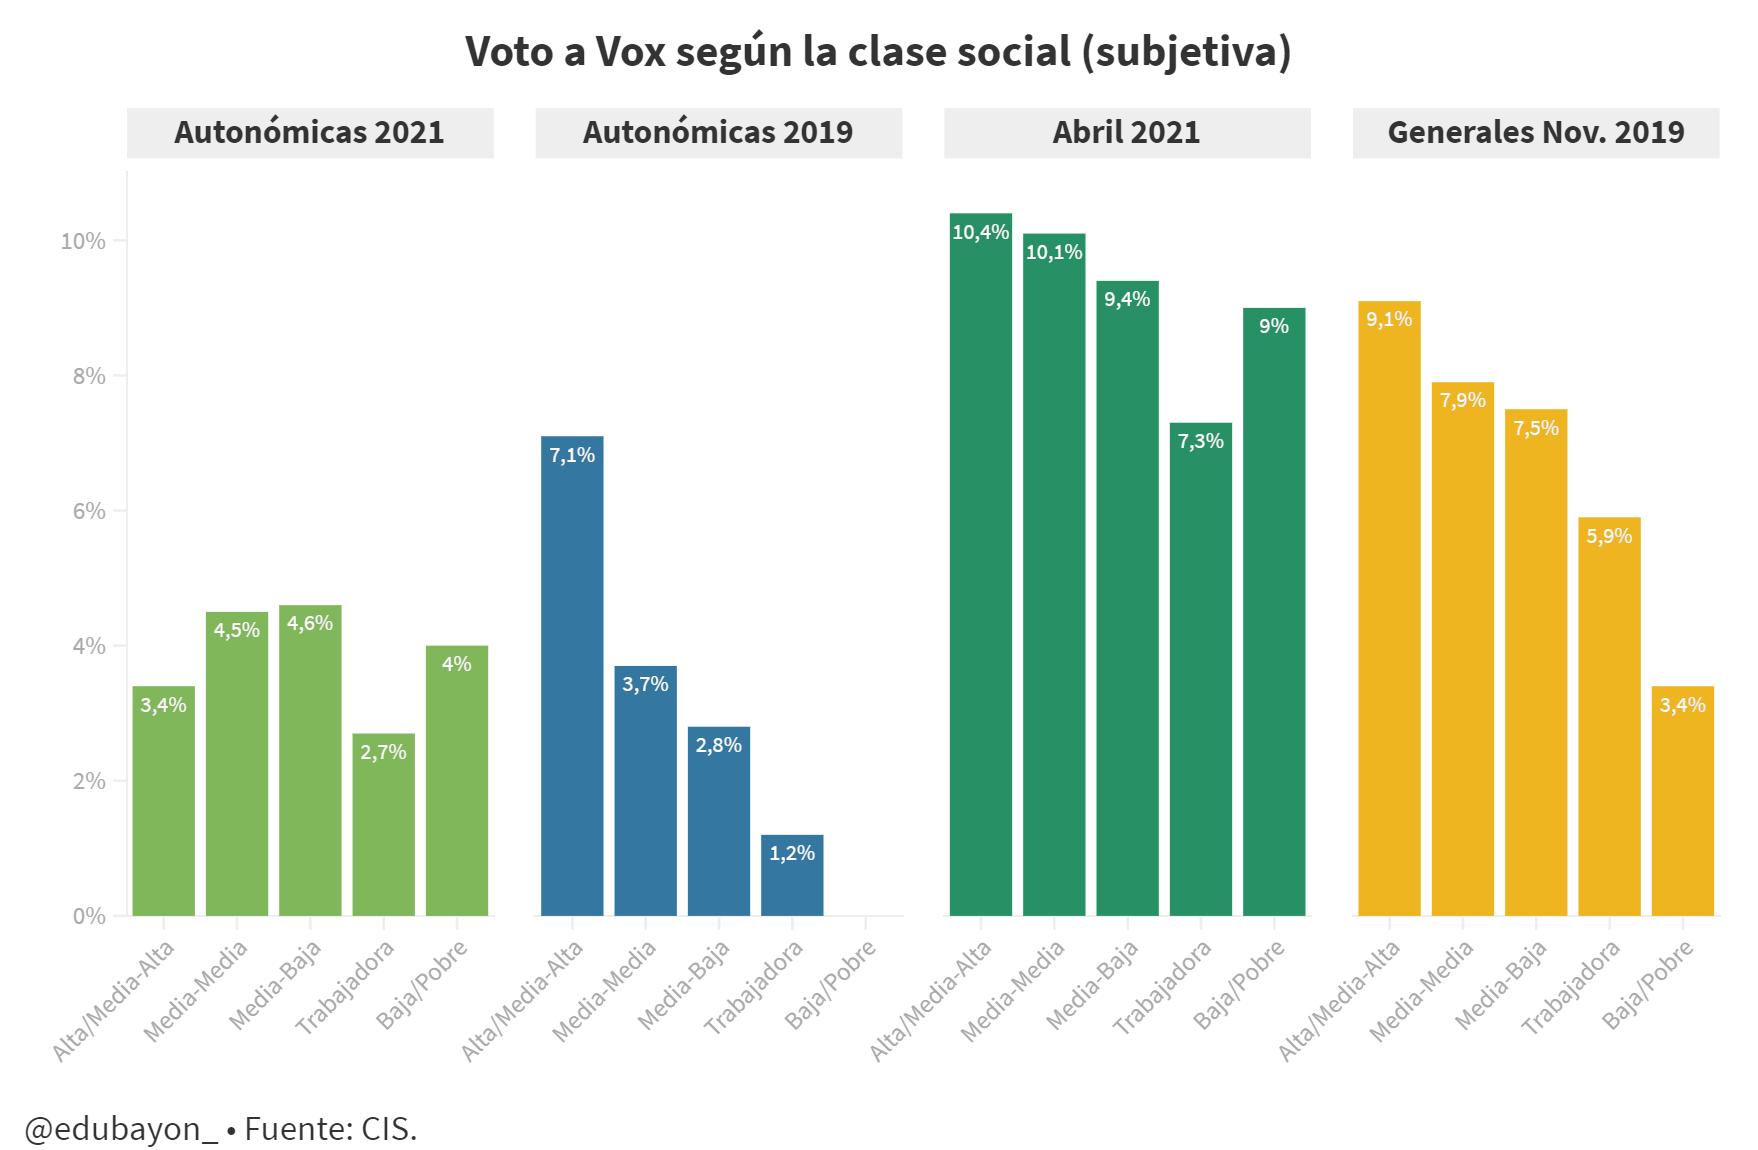 Voto según clase social